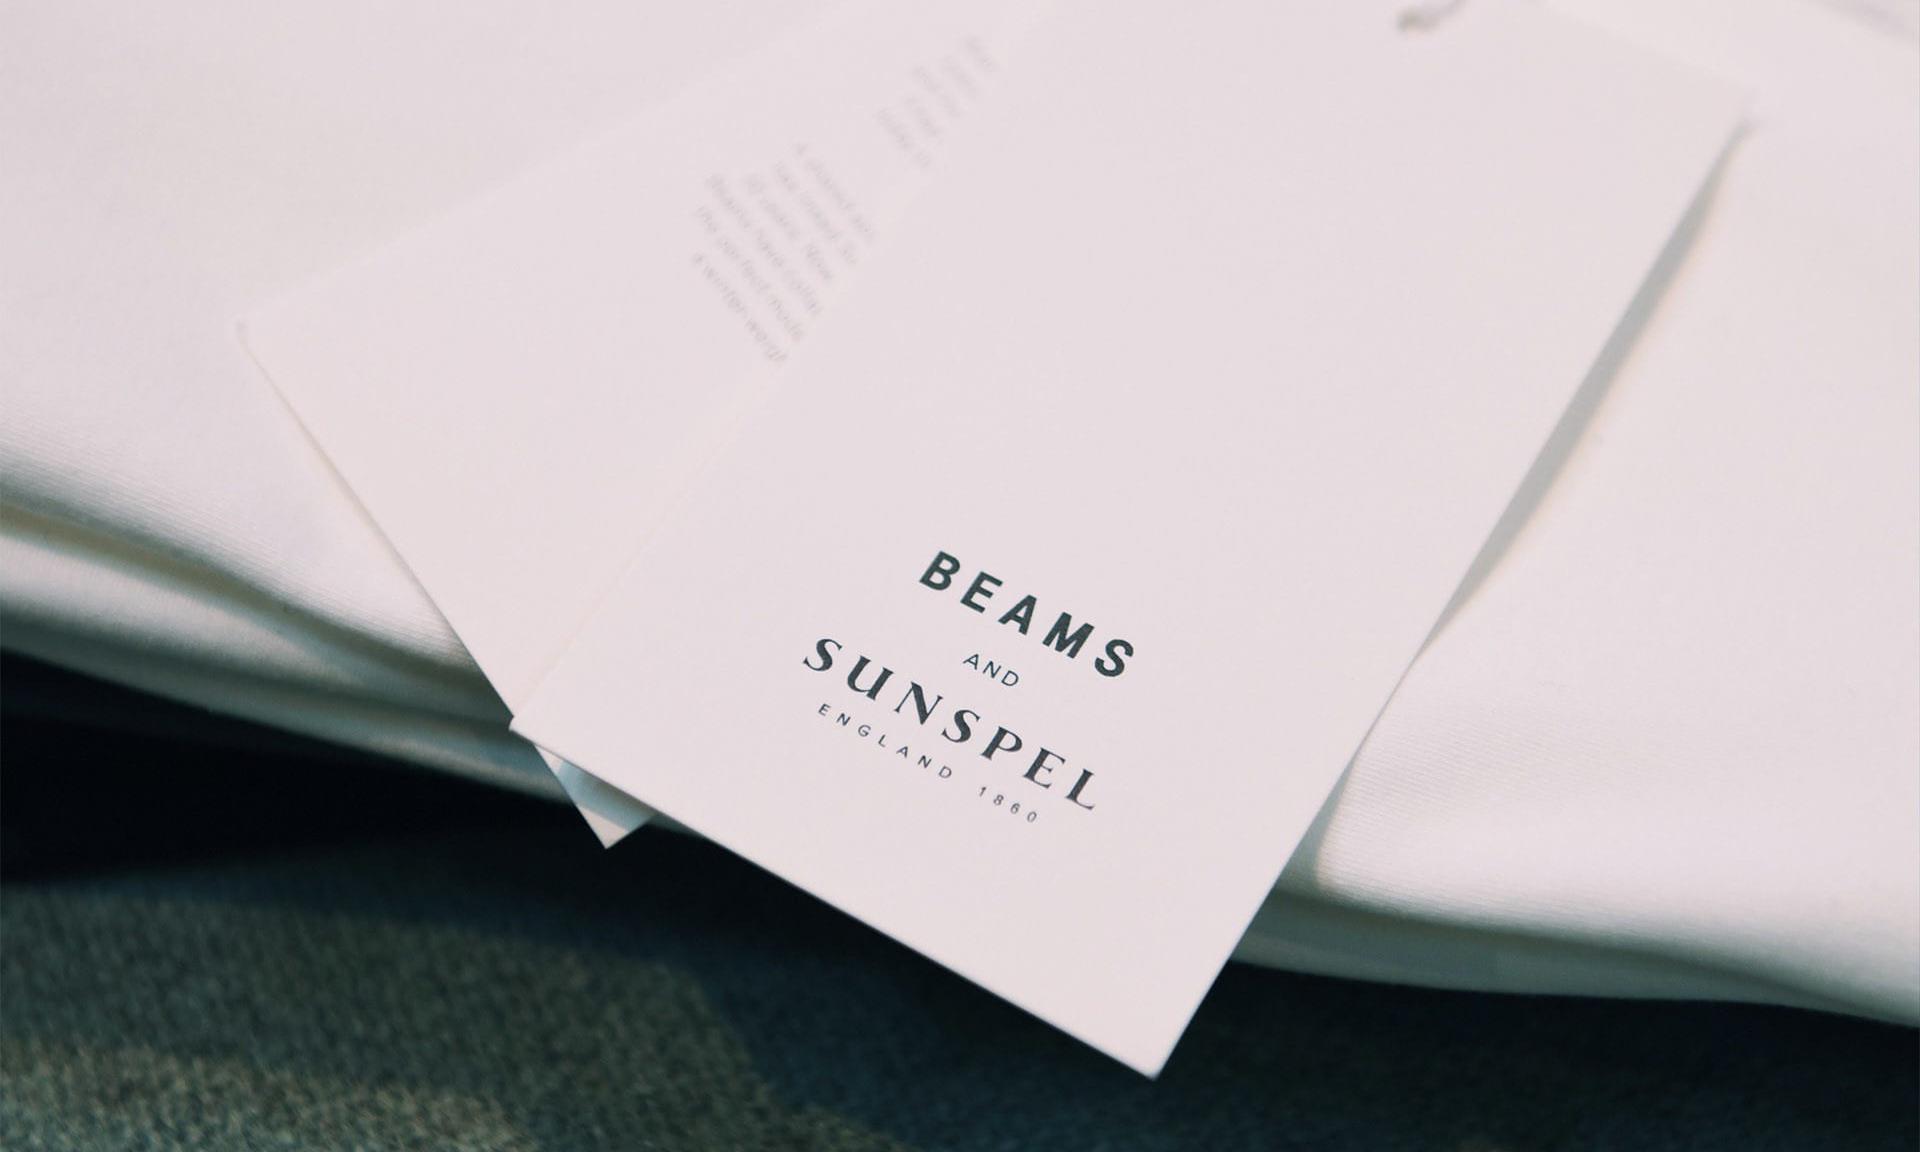 BEAMS 与 Sanspell 首次合作带来限定 T 恤单品